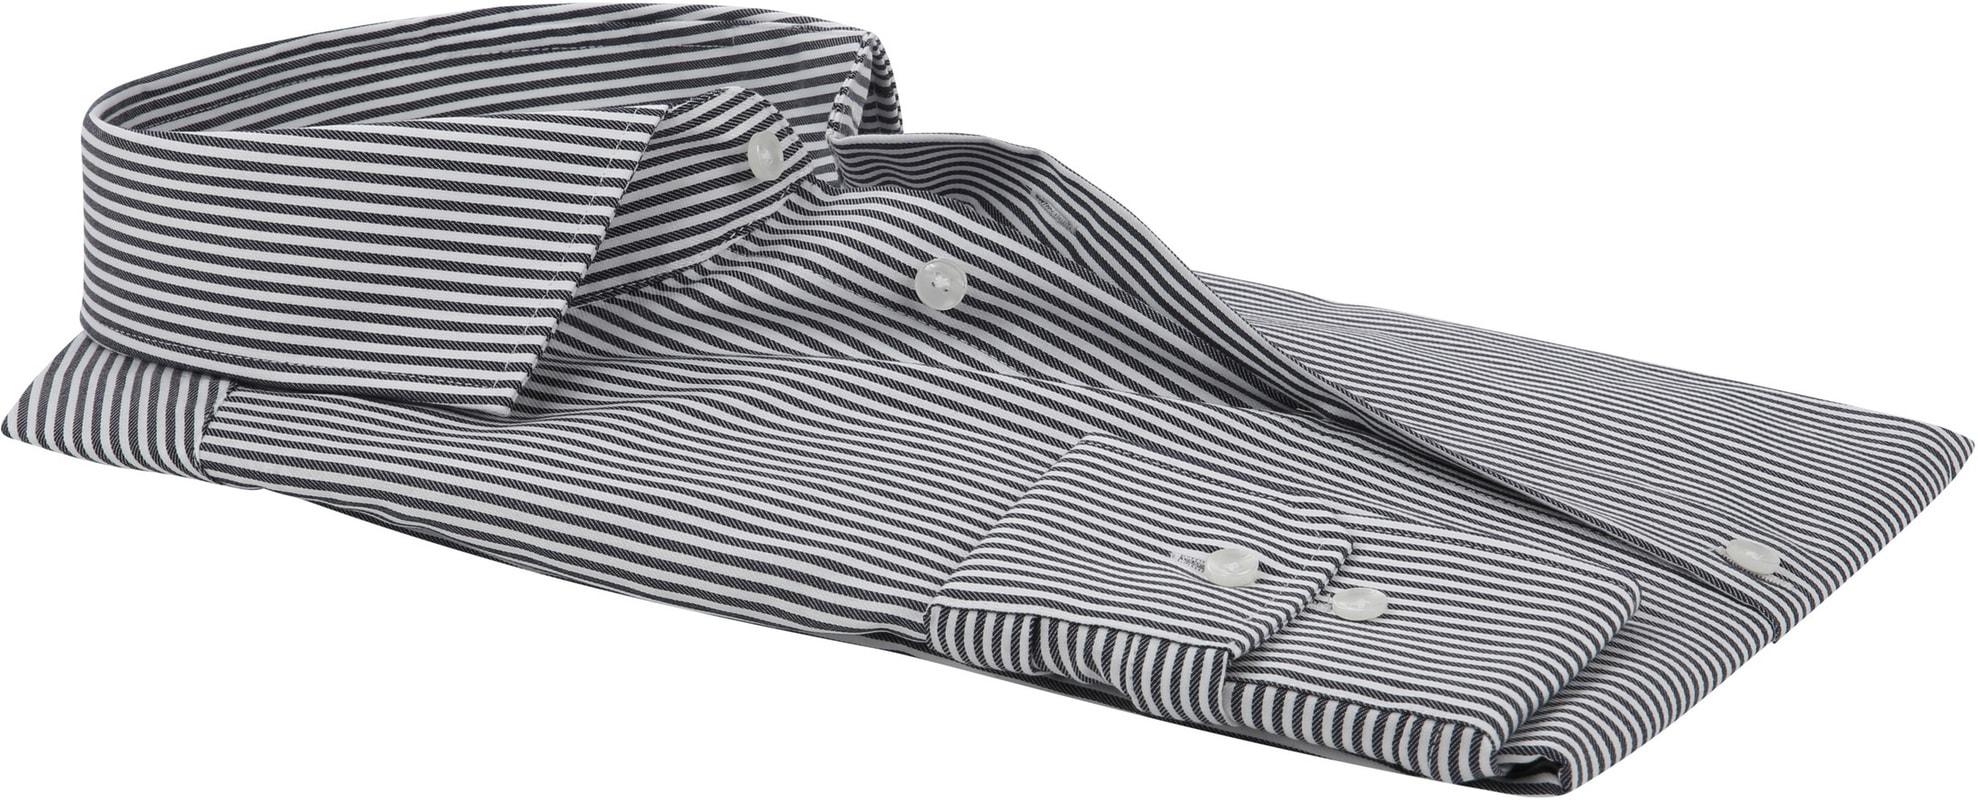 Seidensticker Overhemd Grijs Strepen foto 3